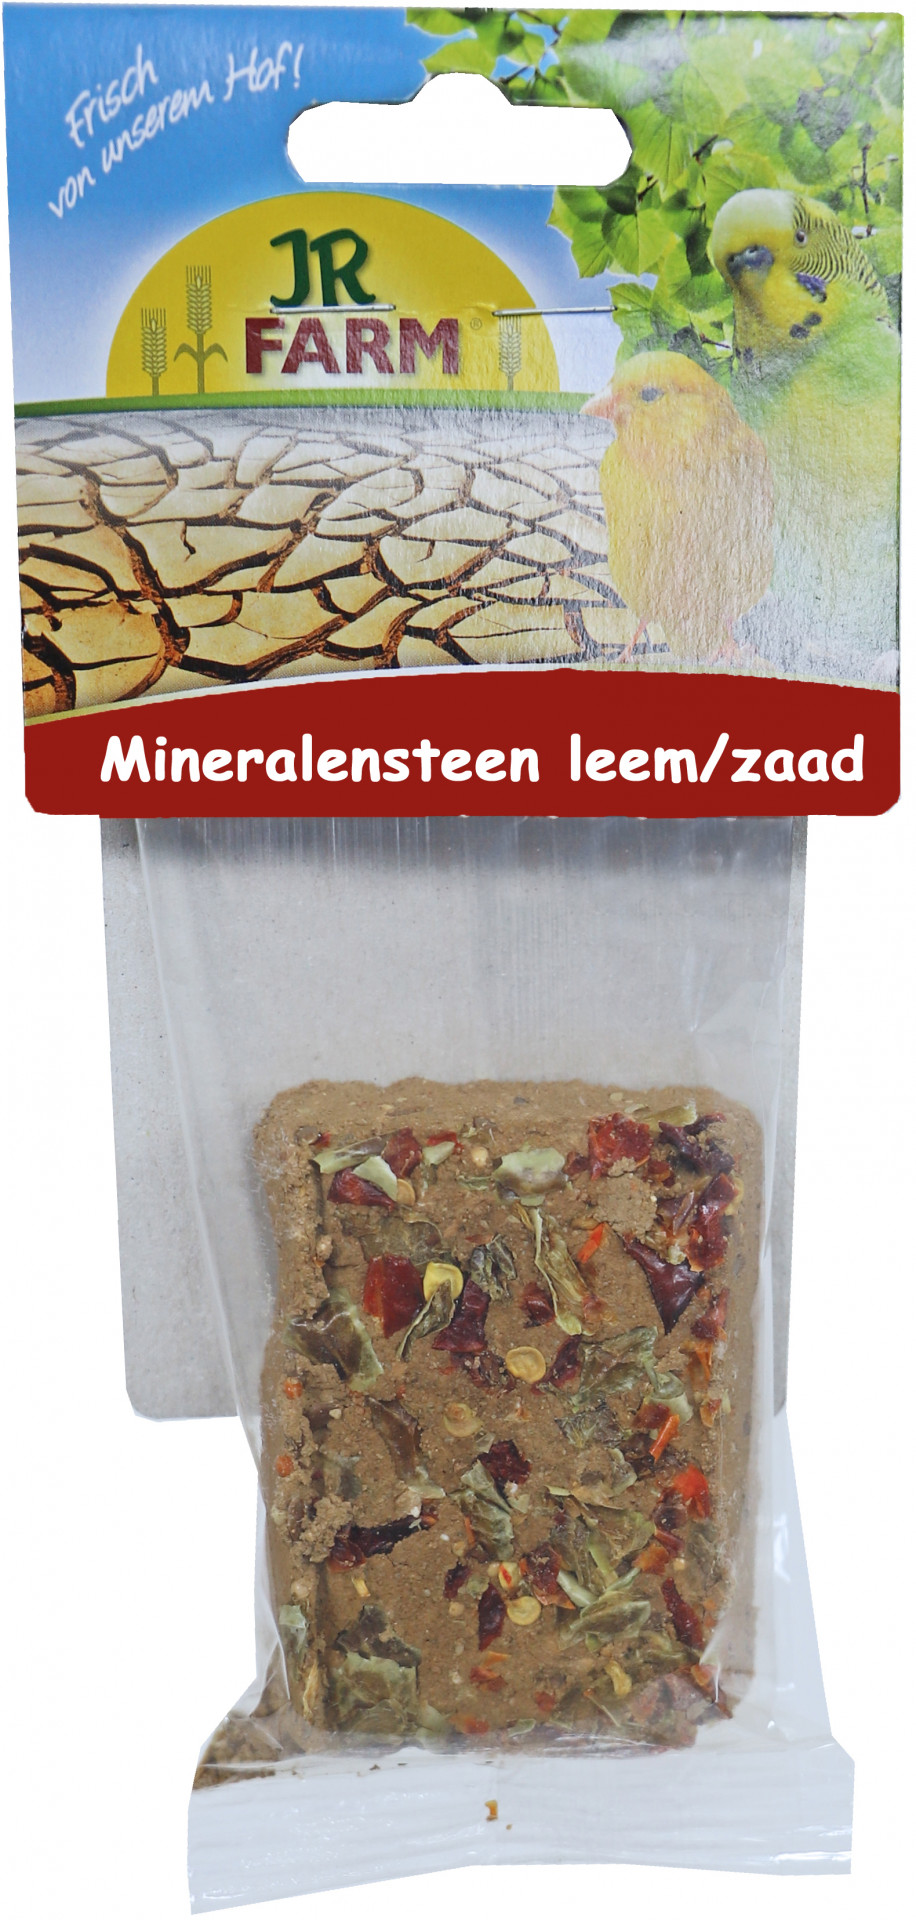 JR Farm mineraalsteen leem/zaad 75 gr